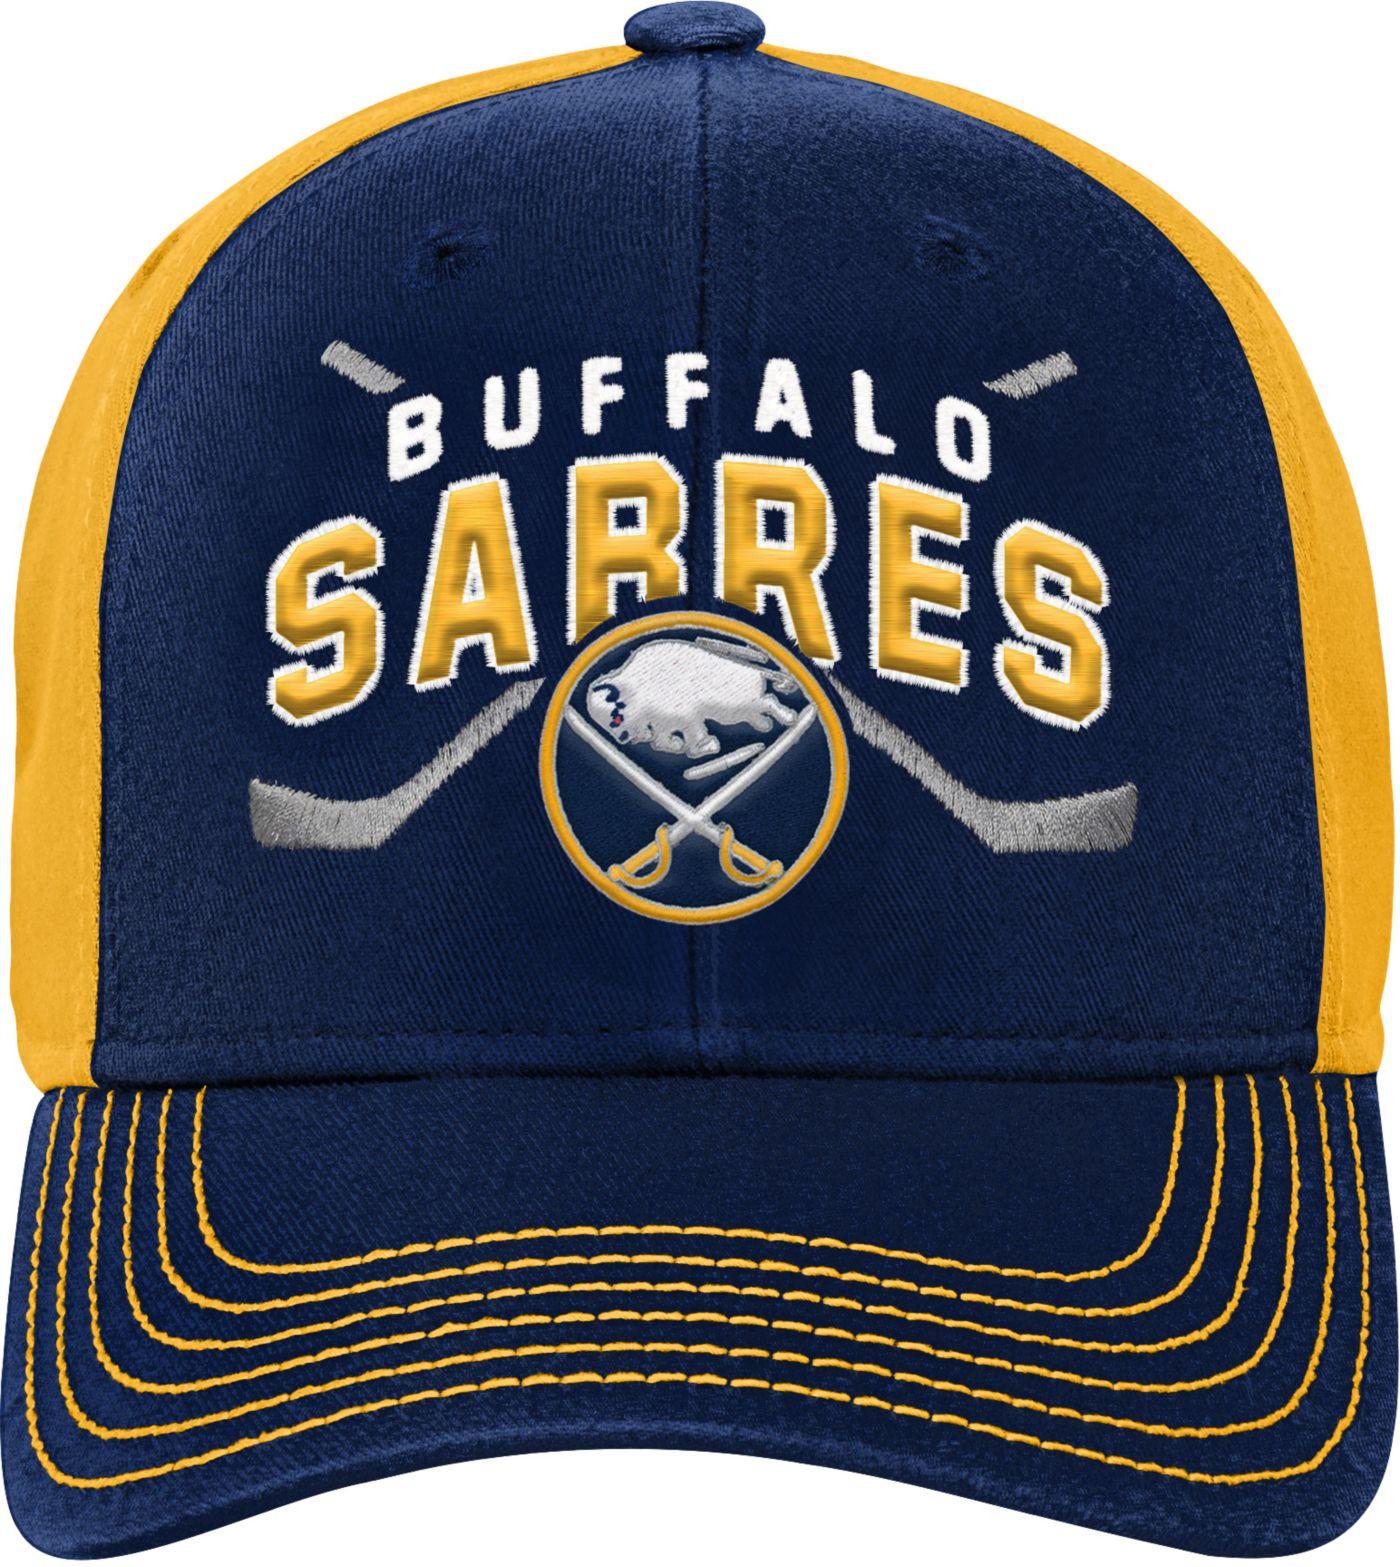 NHL Youth Buffalo Sabres Basic Strucutred Navy Adjustable Hat